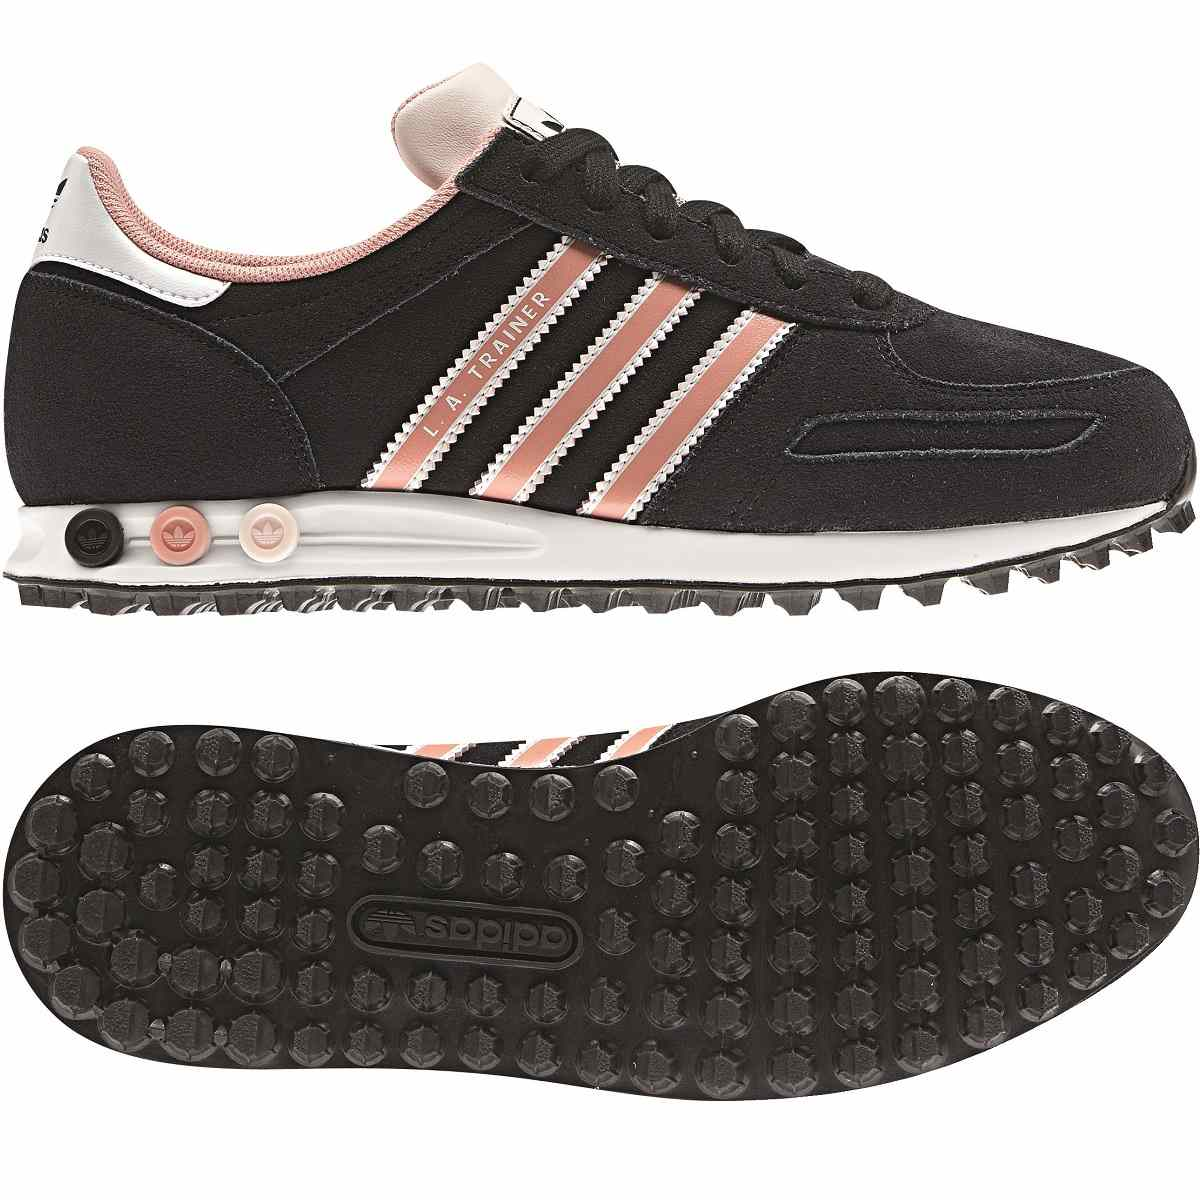 adidas la trainer damen schuhe turnschuhe sneakers schwarz rosa. Black Bedroom Furniture Sets. Home Design Ideas